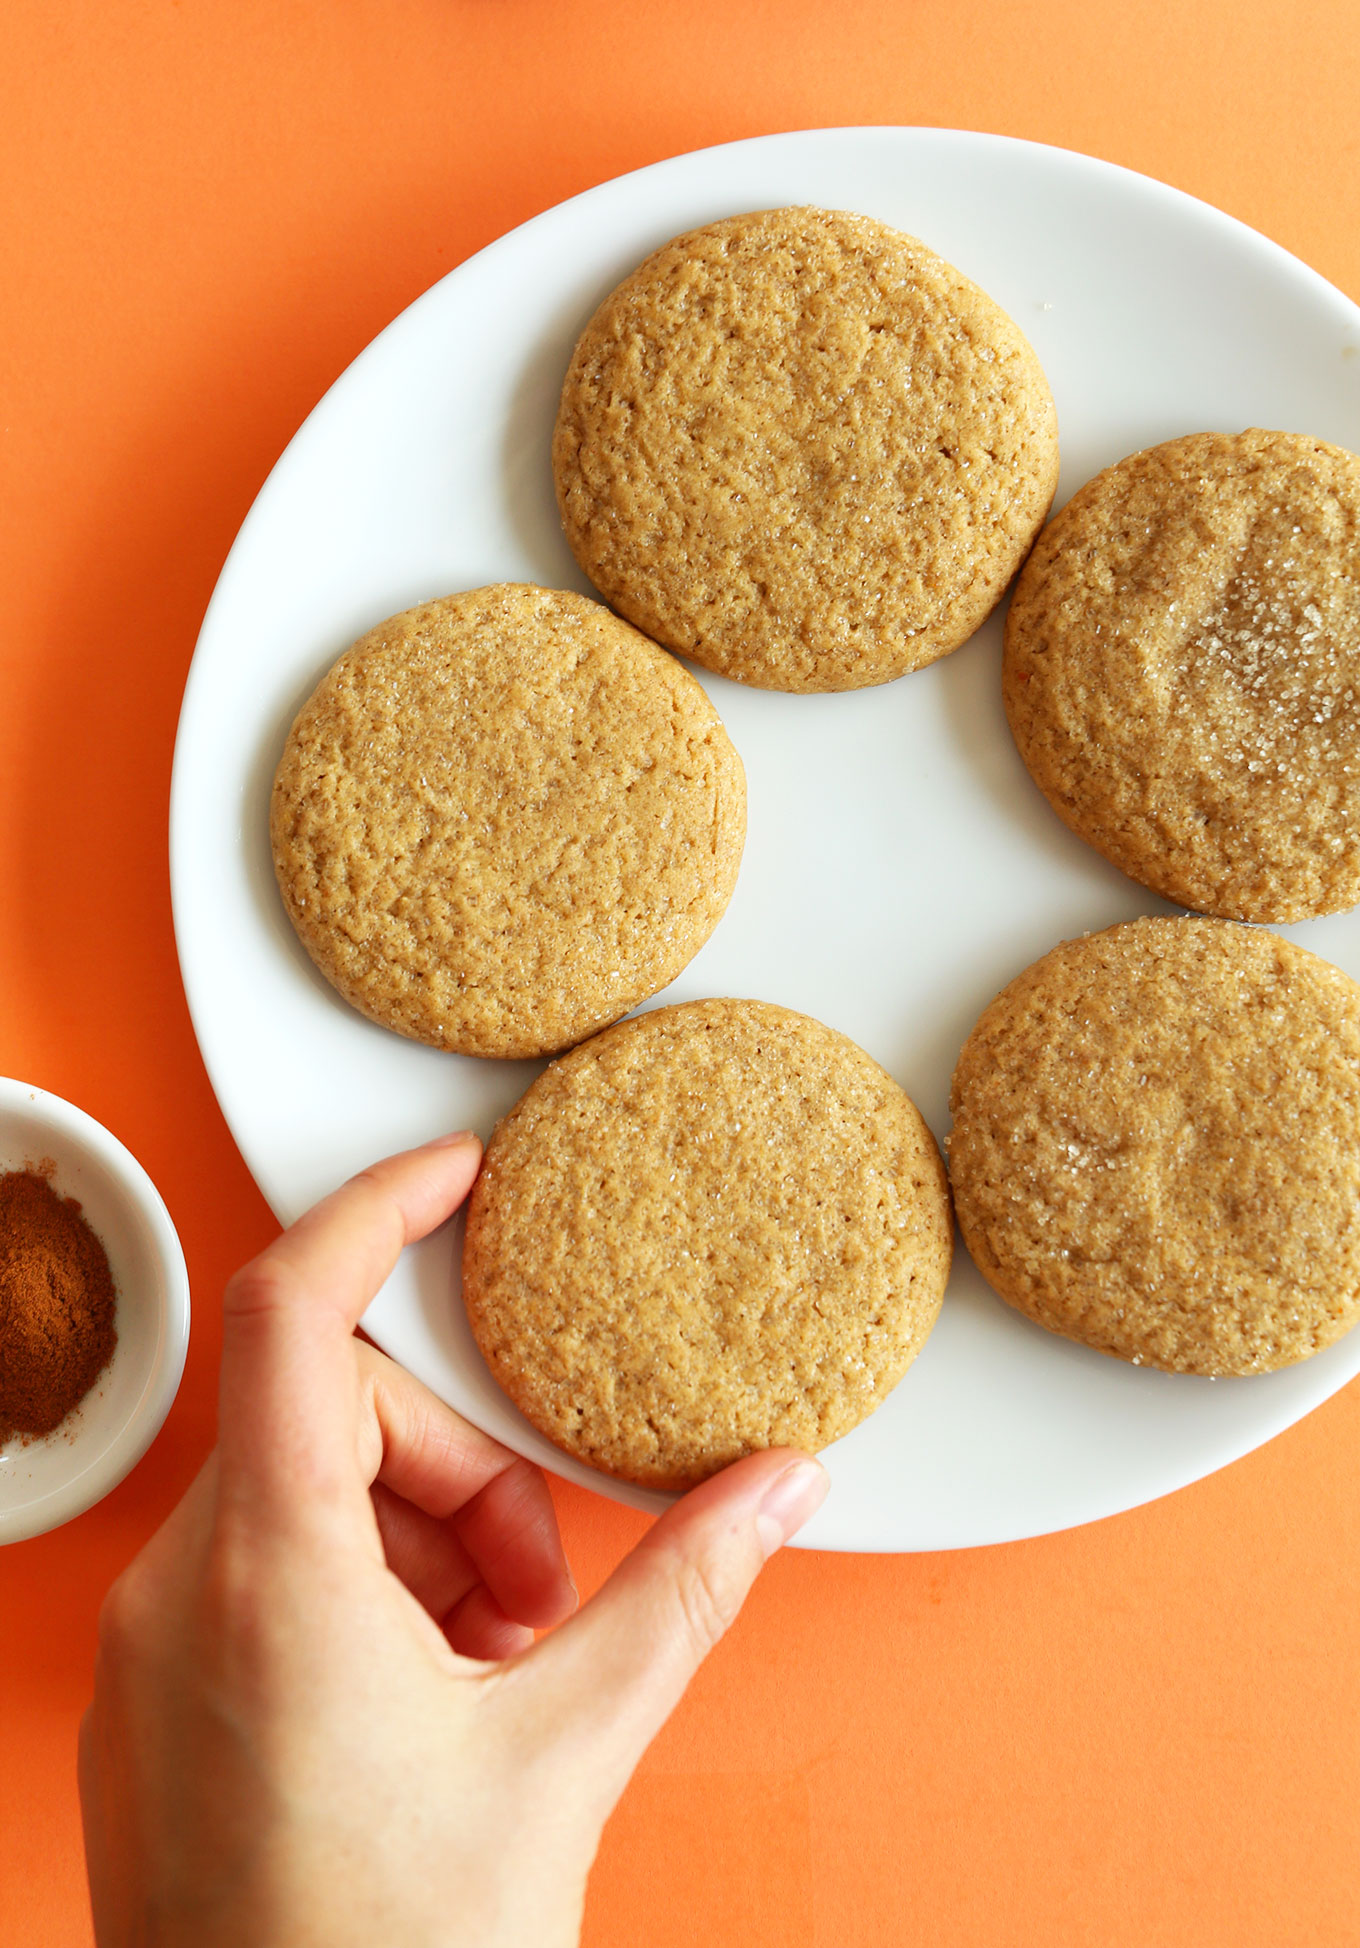 Grabbing a Vegan Pumpkin Sugar Cookie from a plate